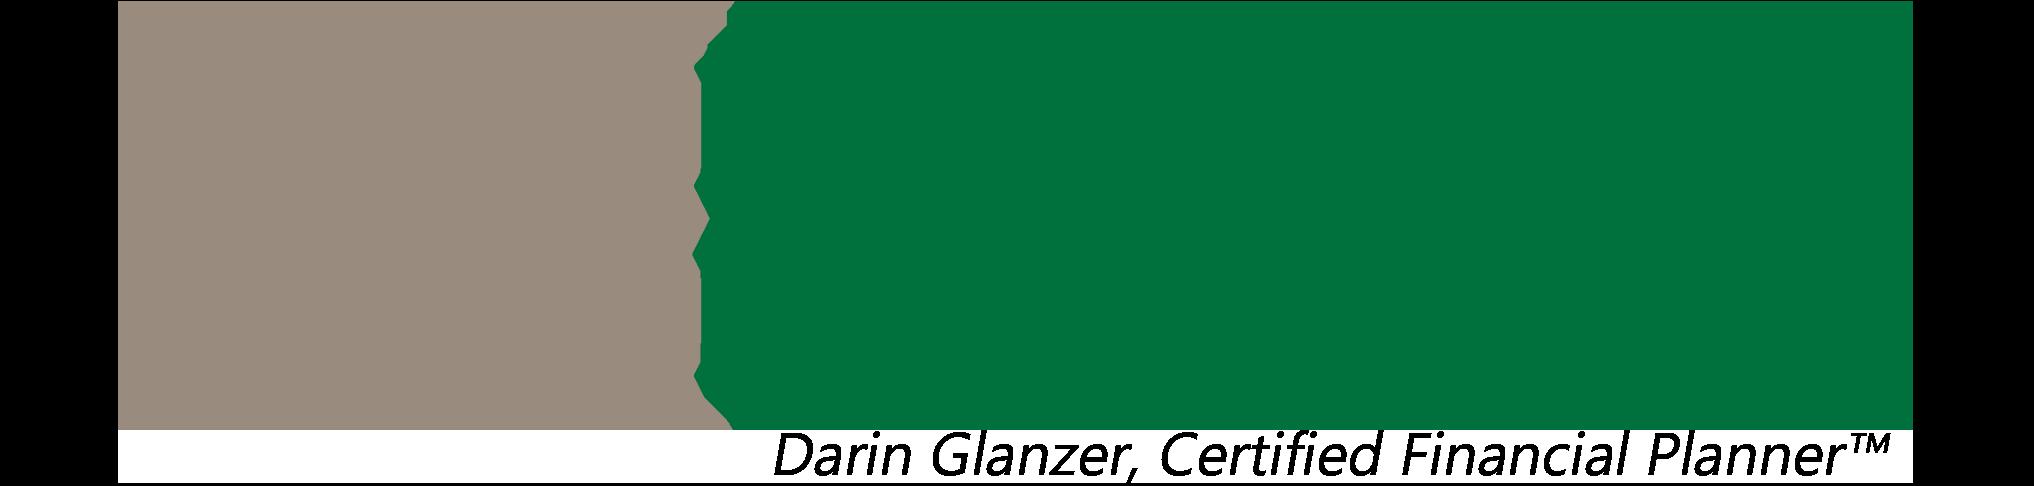 FocusFinancial_Logo_Color_glanzer.png